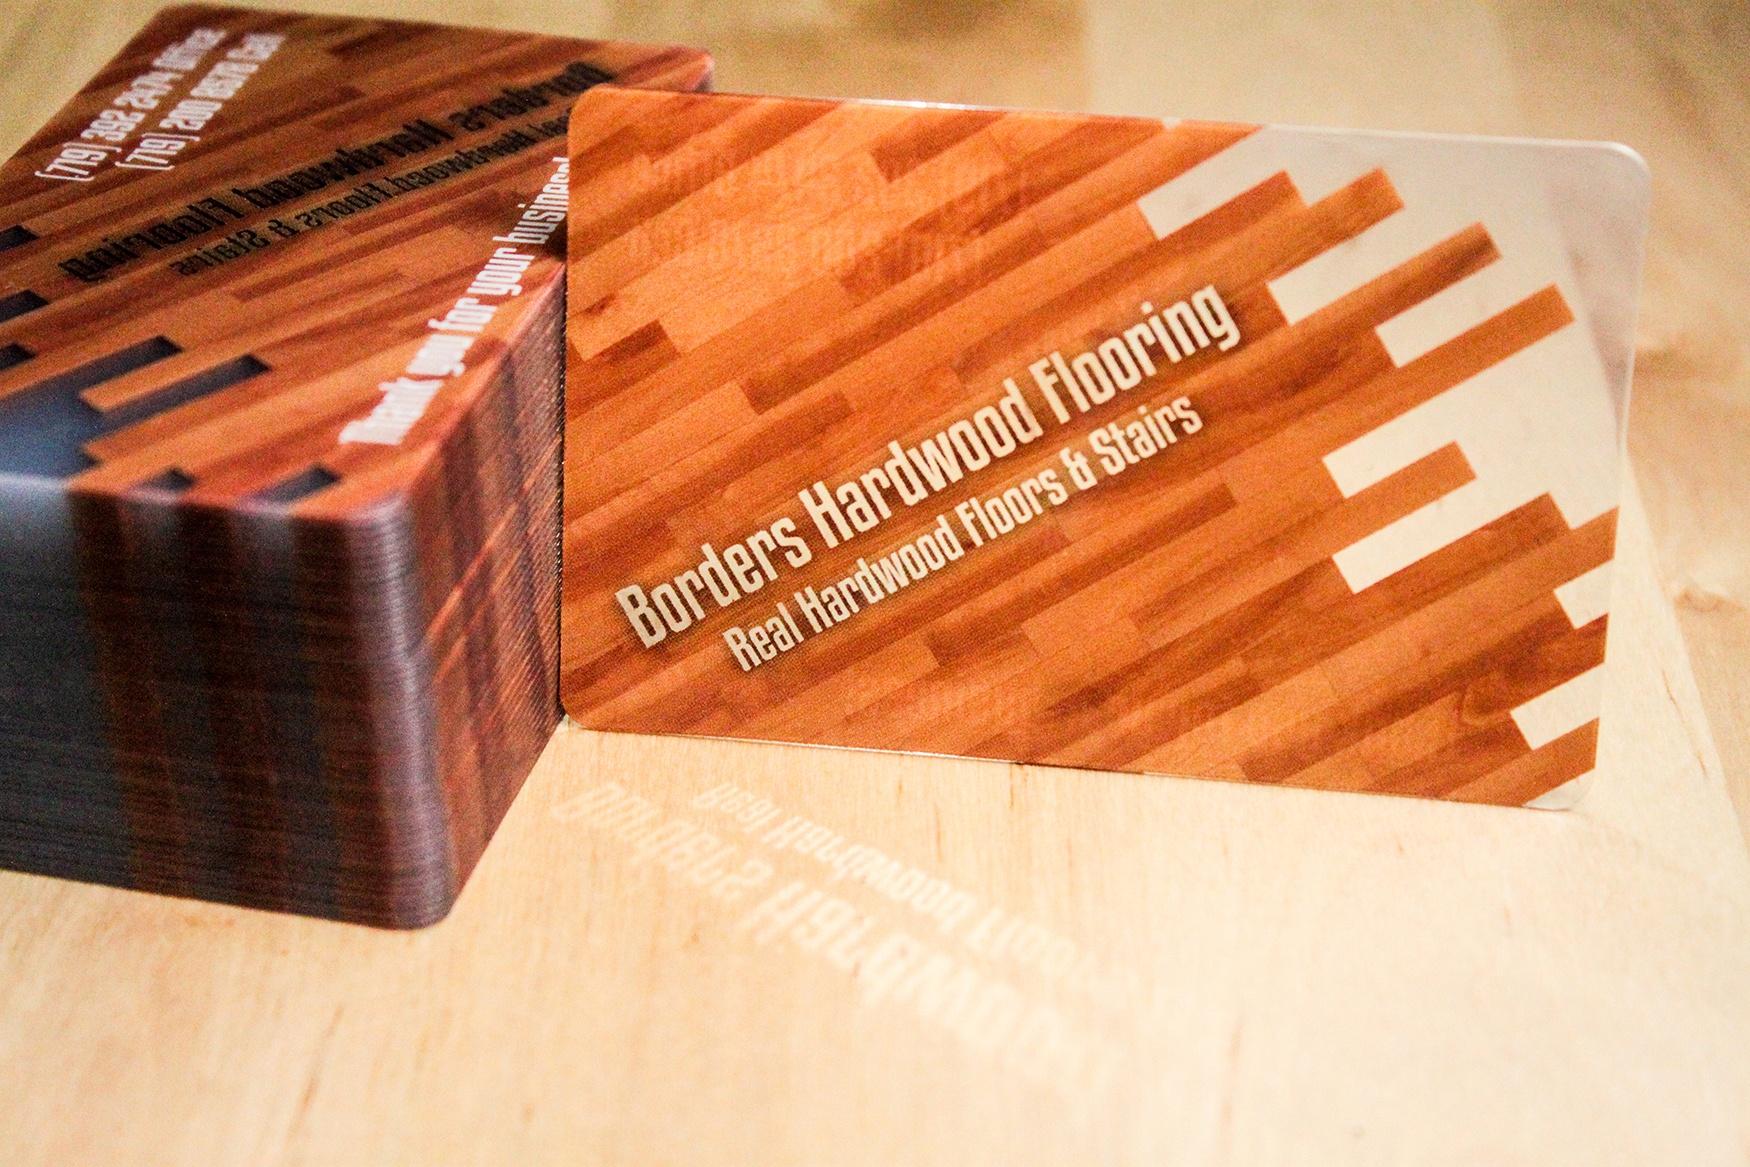 Borders hardwood flooring business cards colourmoves